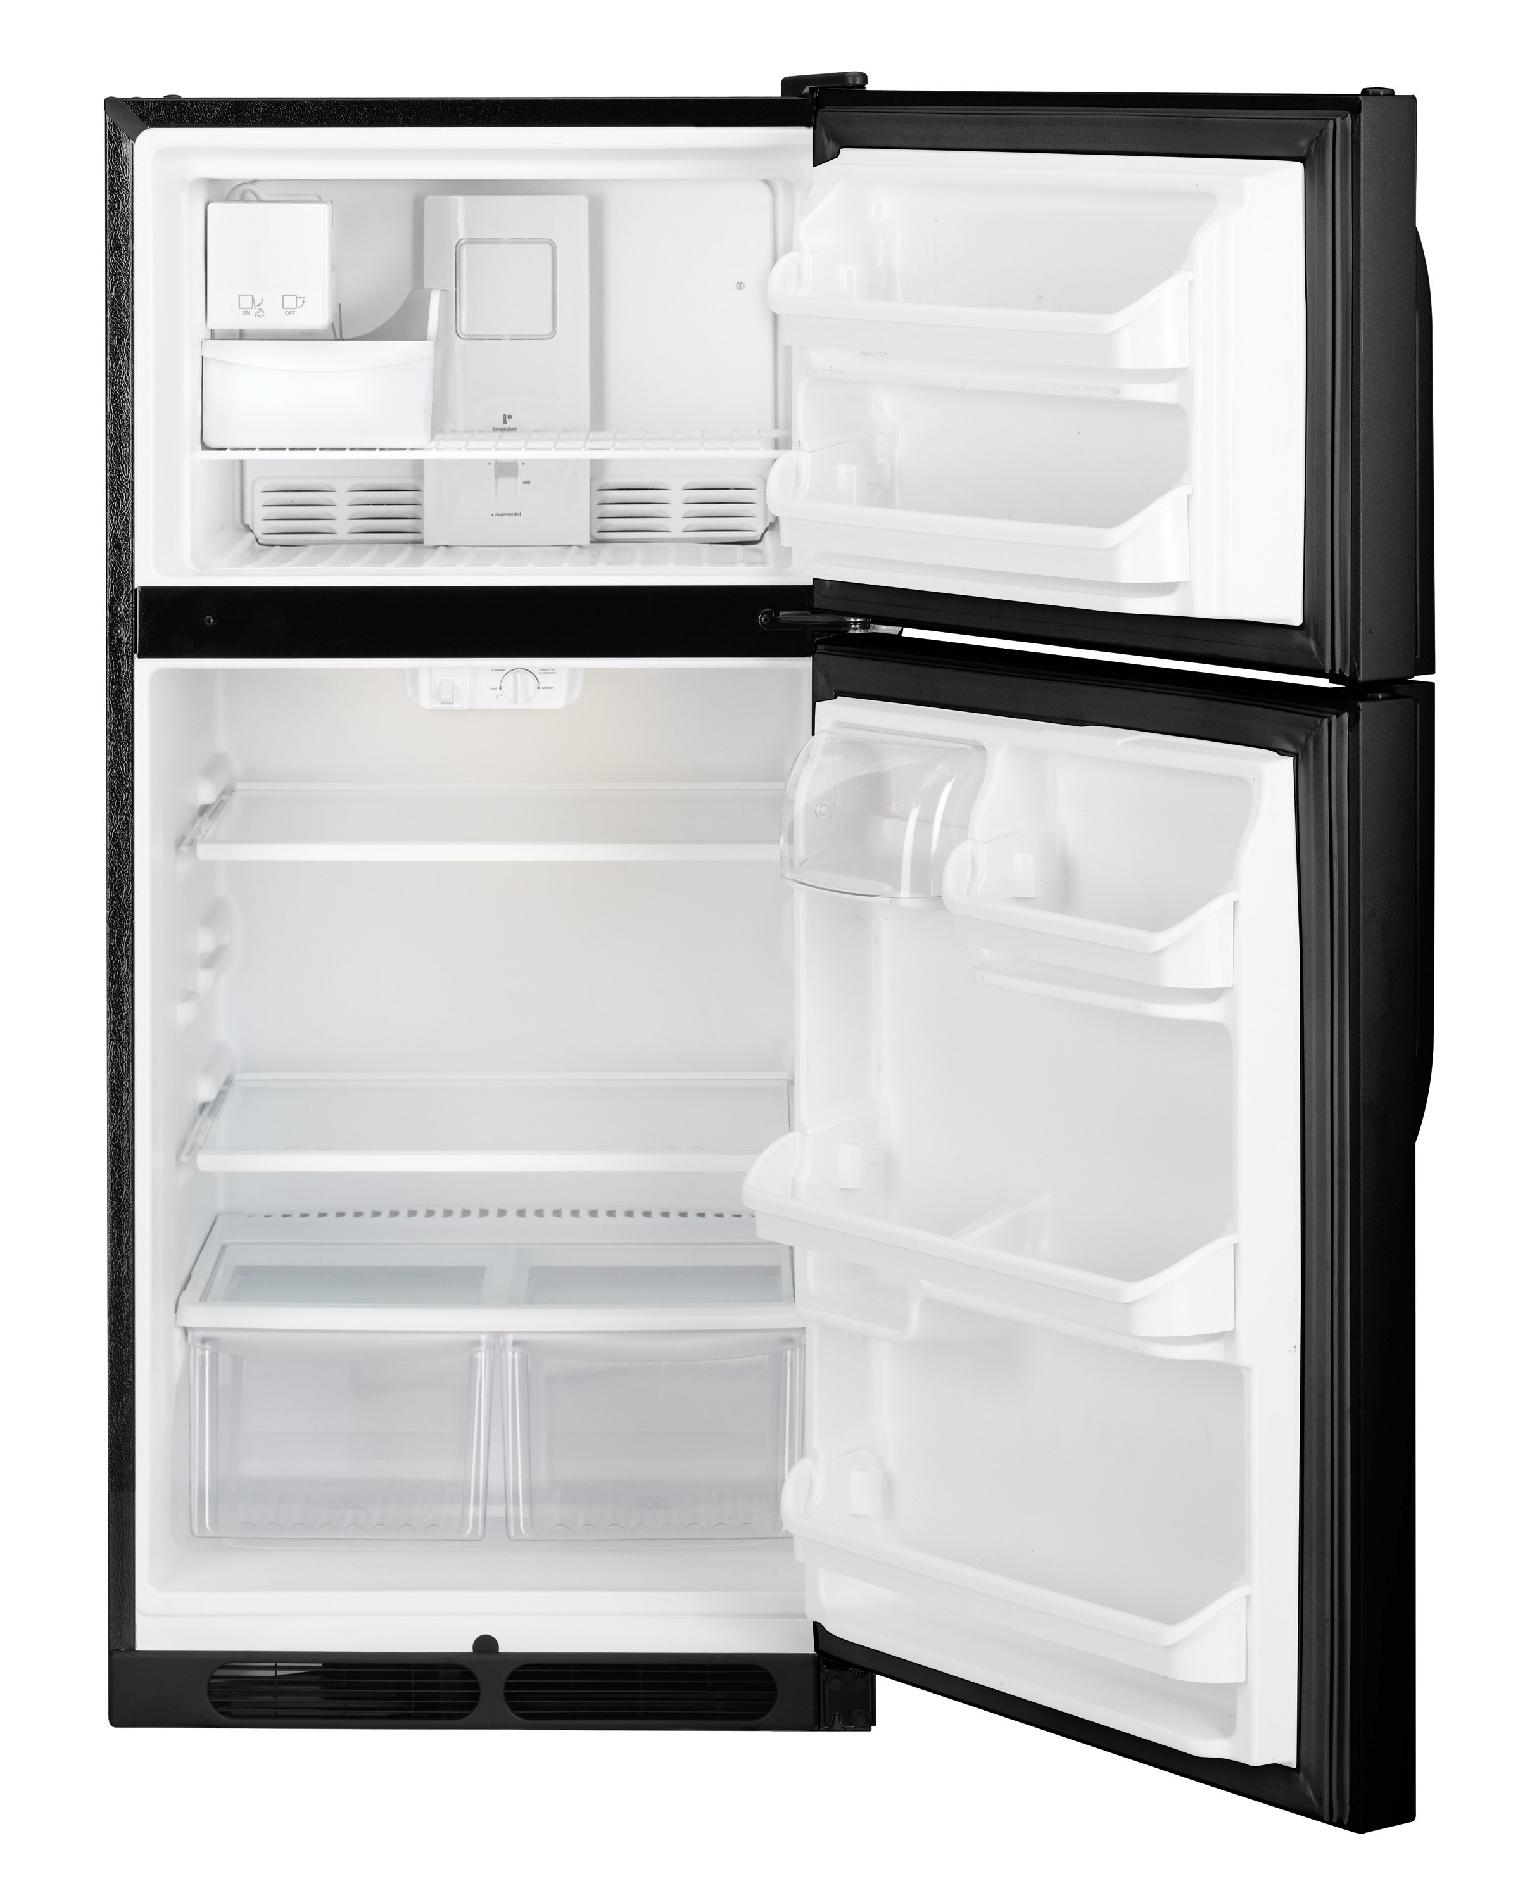 Kenmore 70309 14.5 cu. ft. Top Freezer Refrigerator - Black